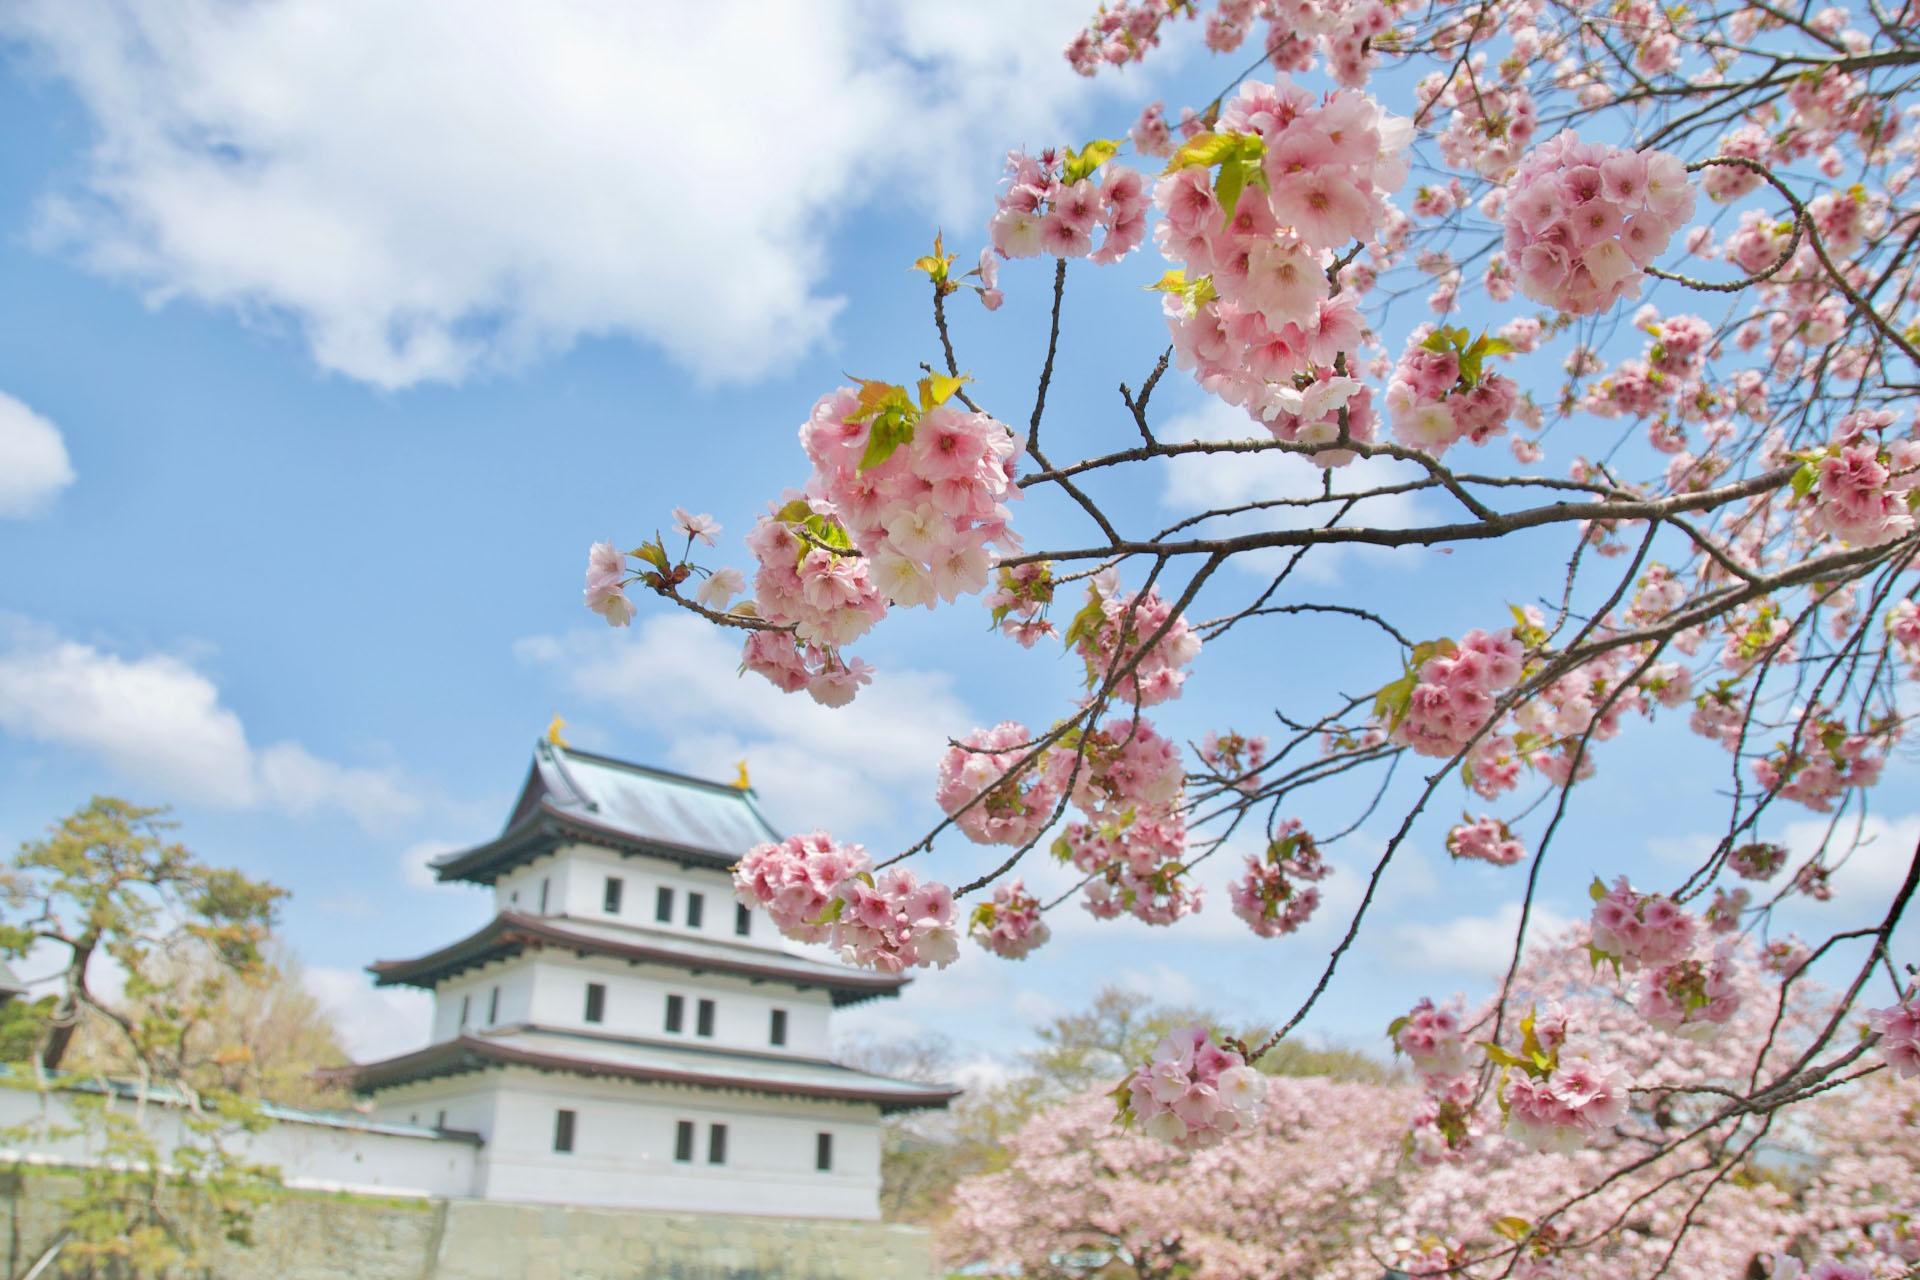 松前城と桜 北海道の風景